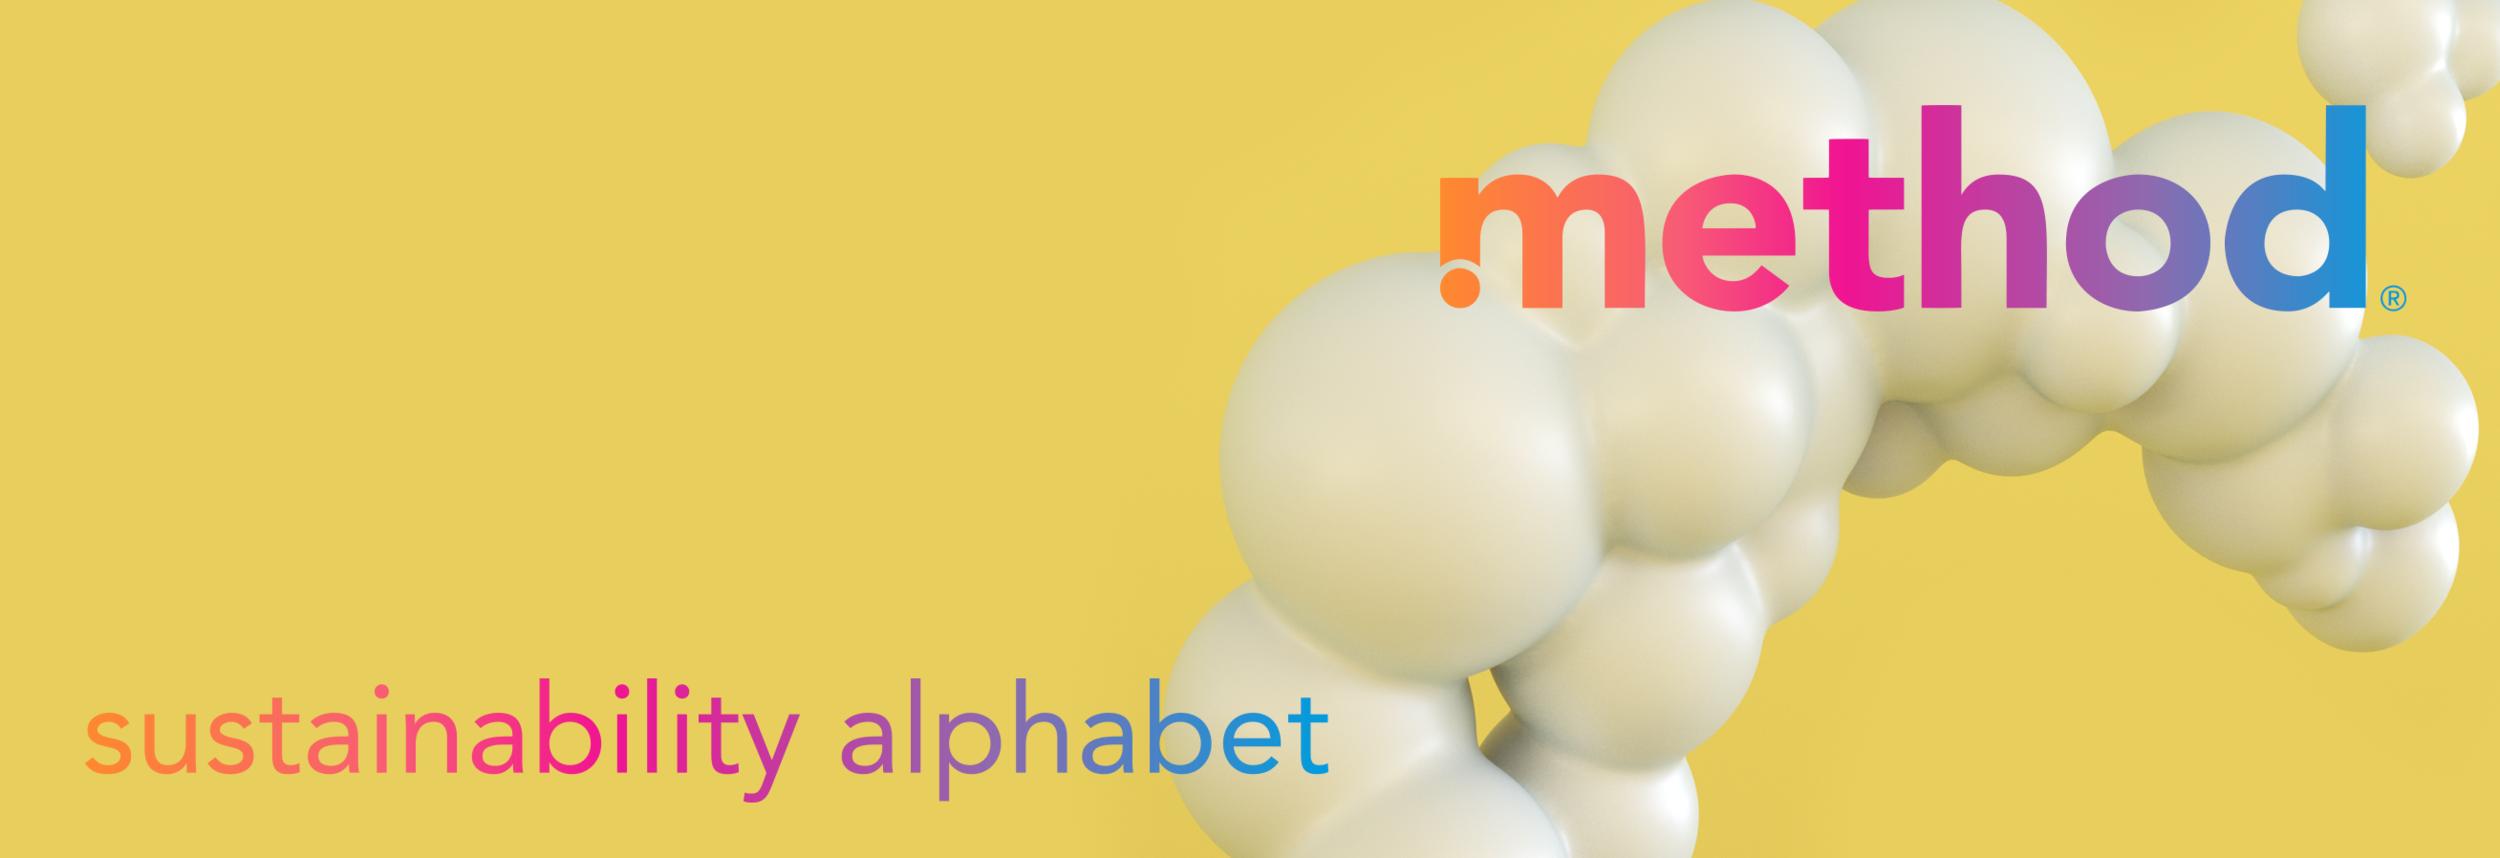 Method Home Sustainability Alphabet Header by Noah Camp